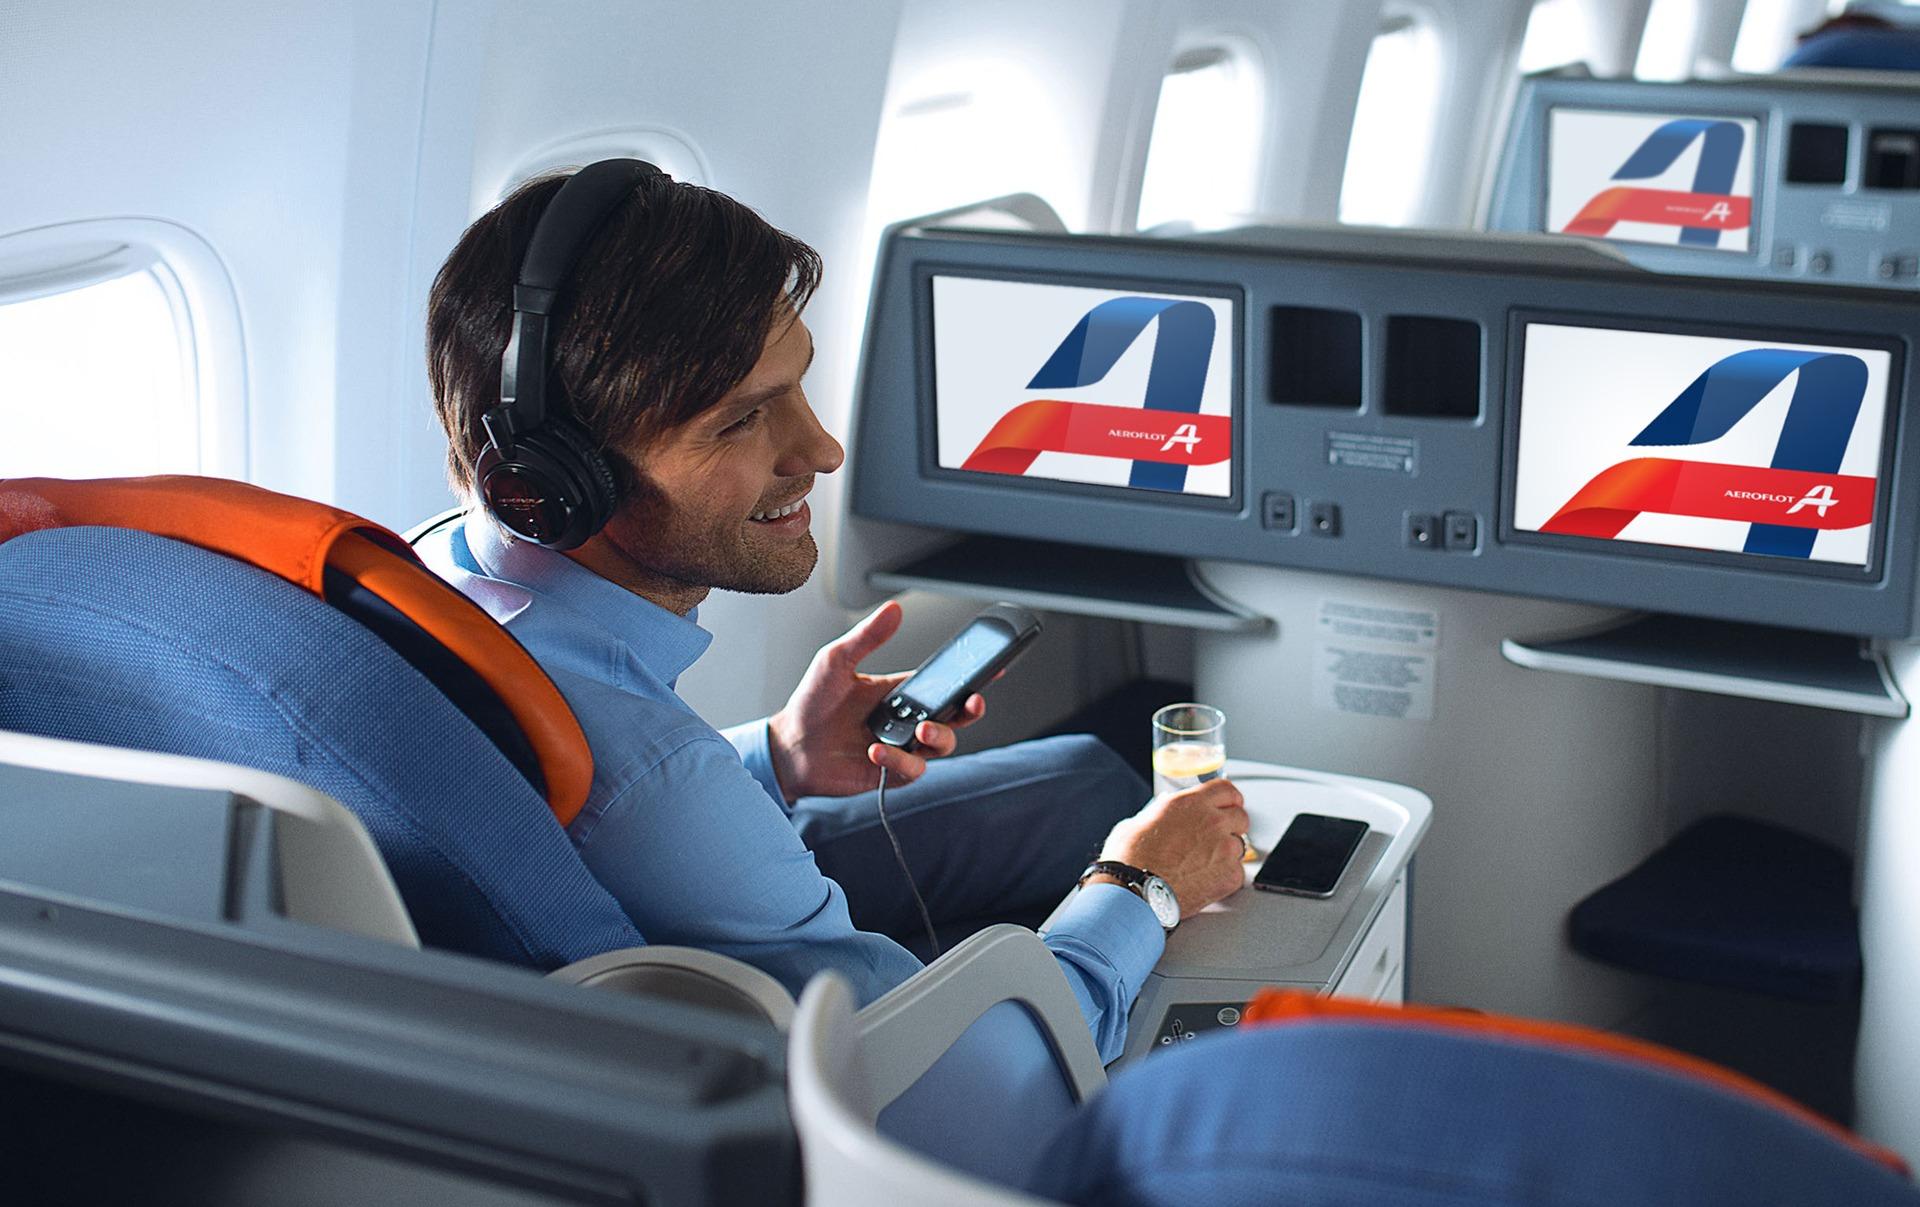 Фирменный стиль авиакомпании, Asgard Branding, лого Аэрофлот, Aeroflot, салон самолета